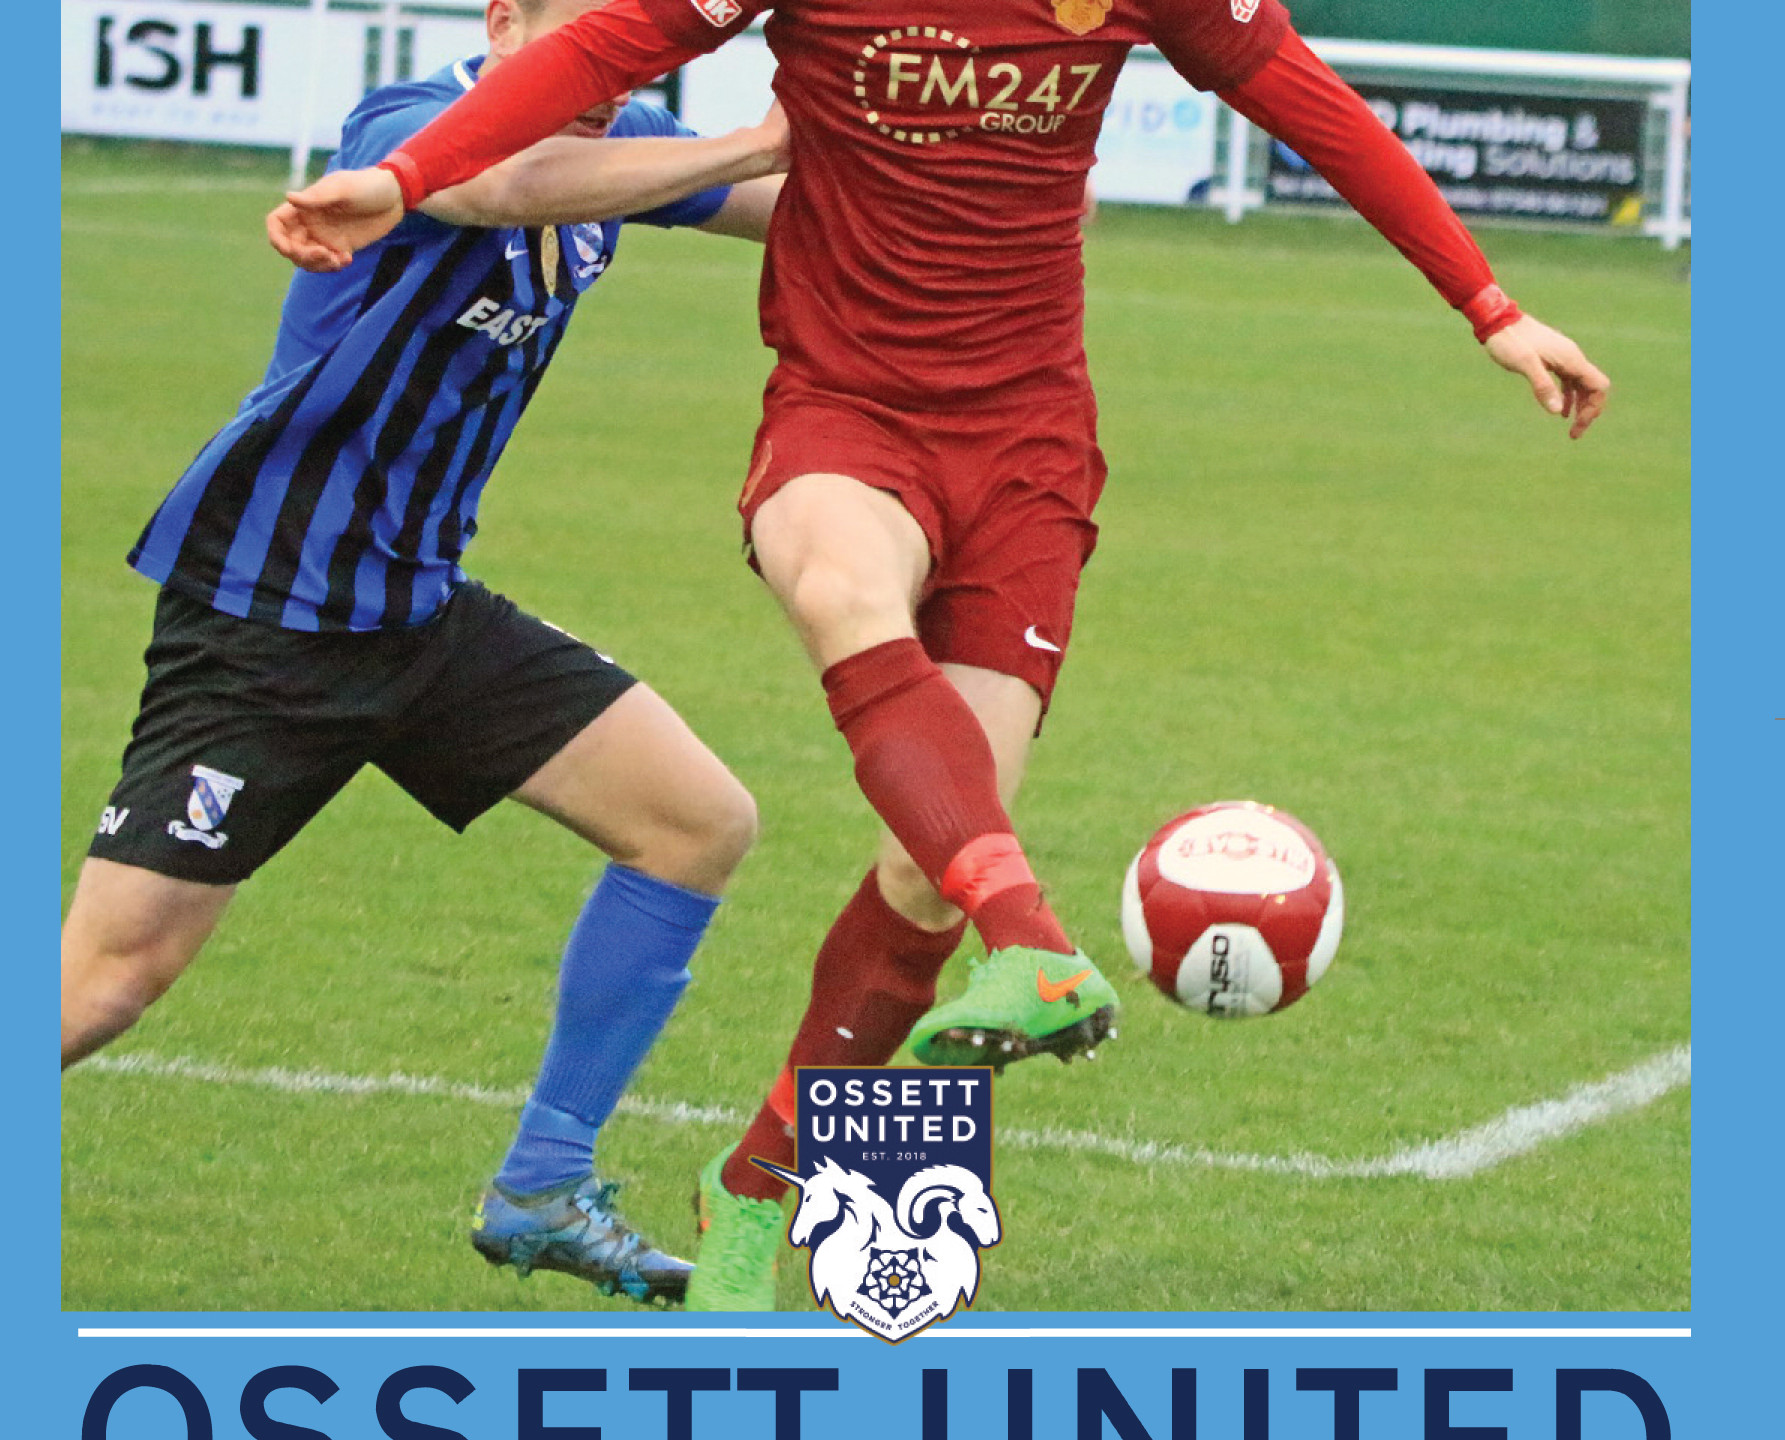 OSSETT Matchday Programm